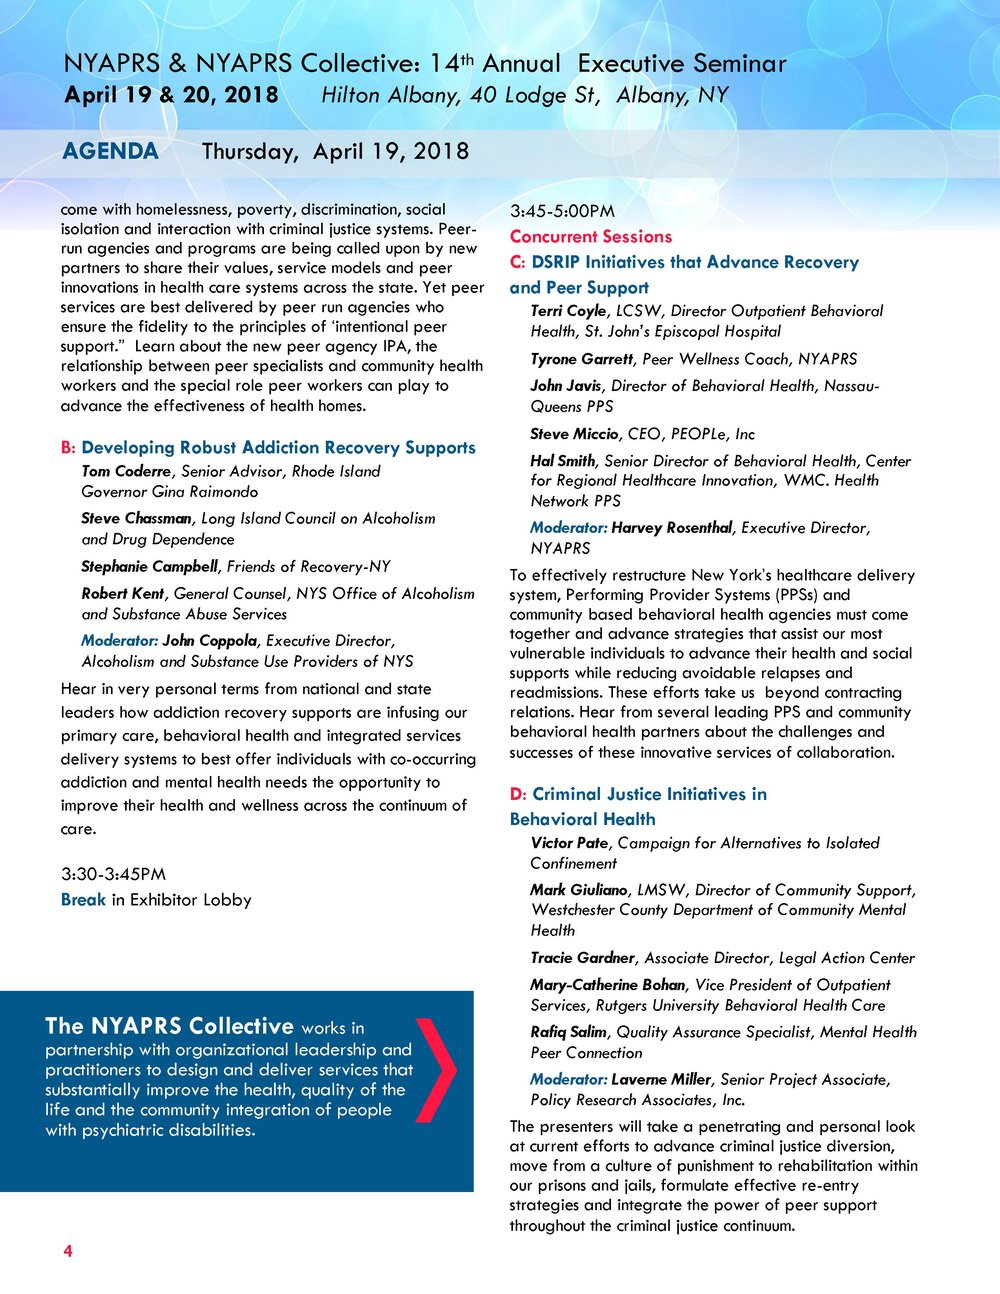 NYAPRS 2018 Executive Seminar Program-4.jpg